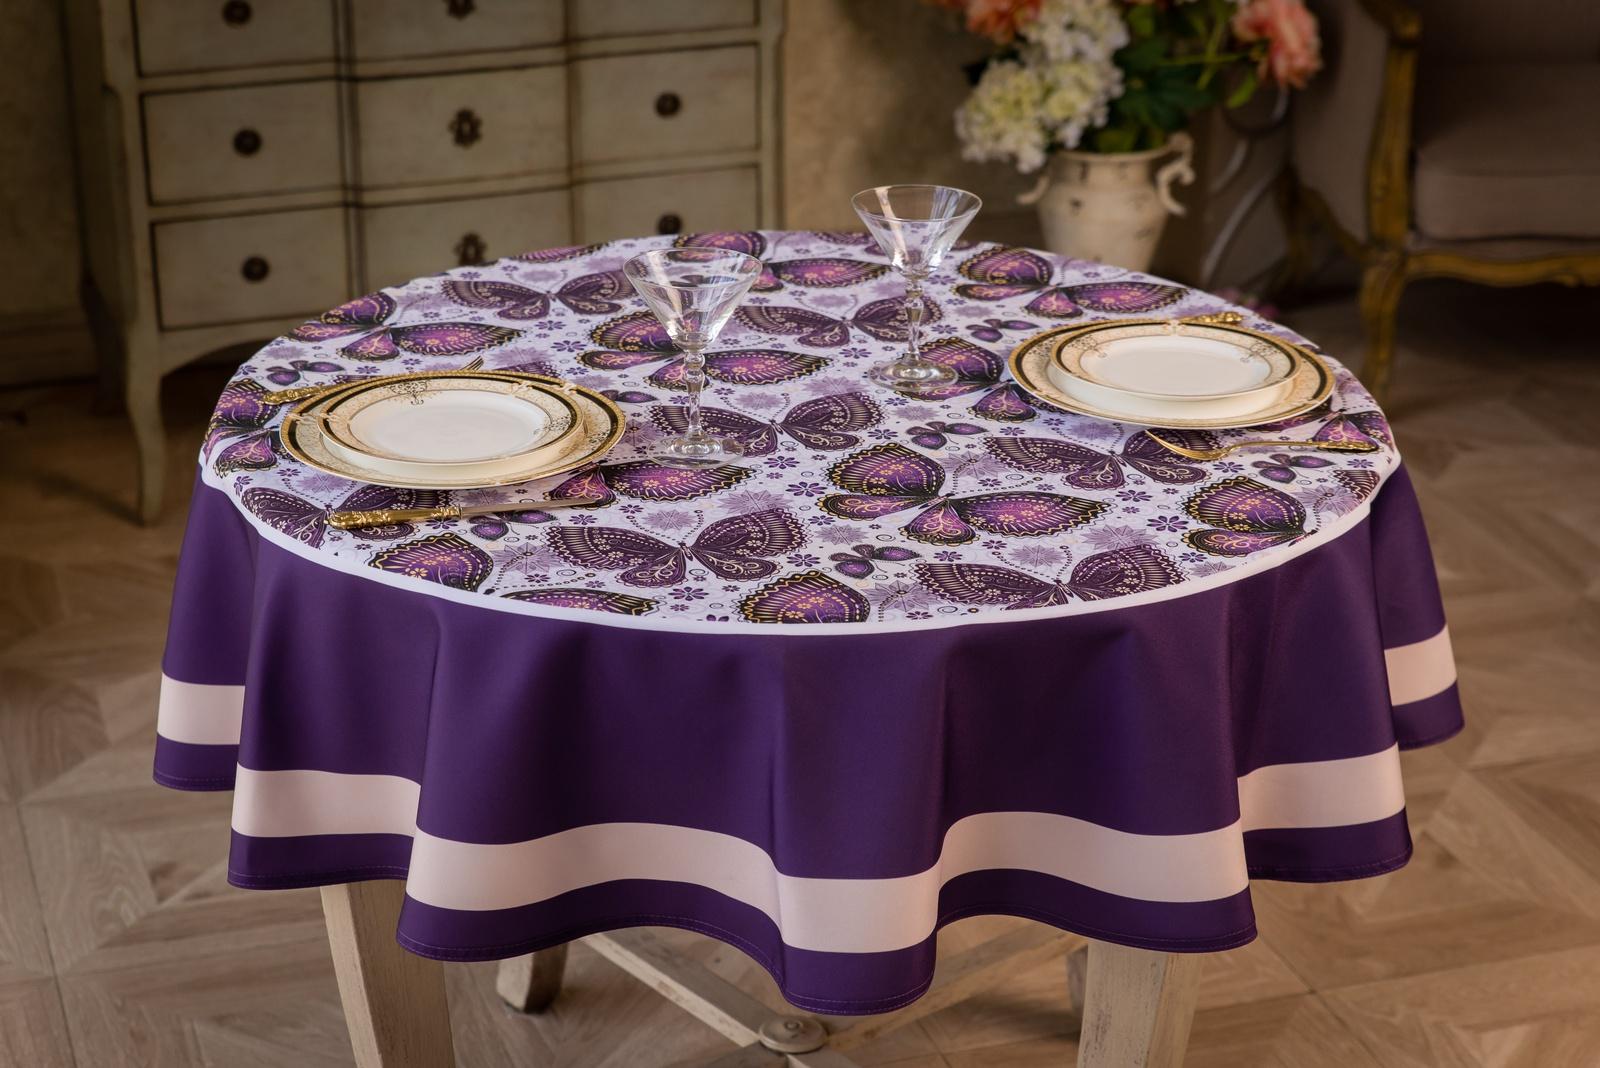 Фото круглой скатерти на столе